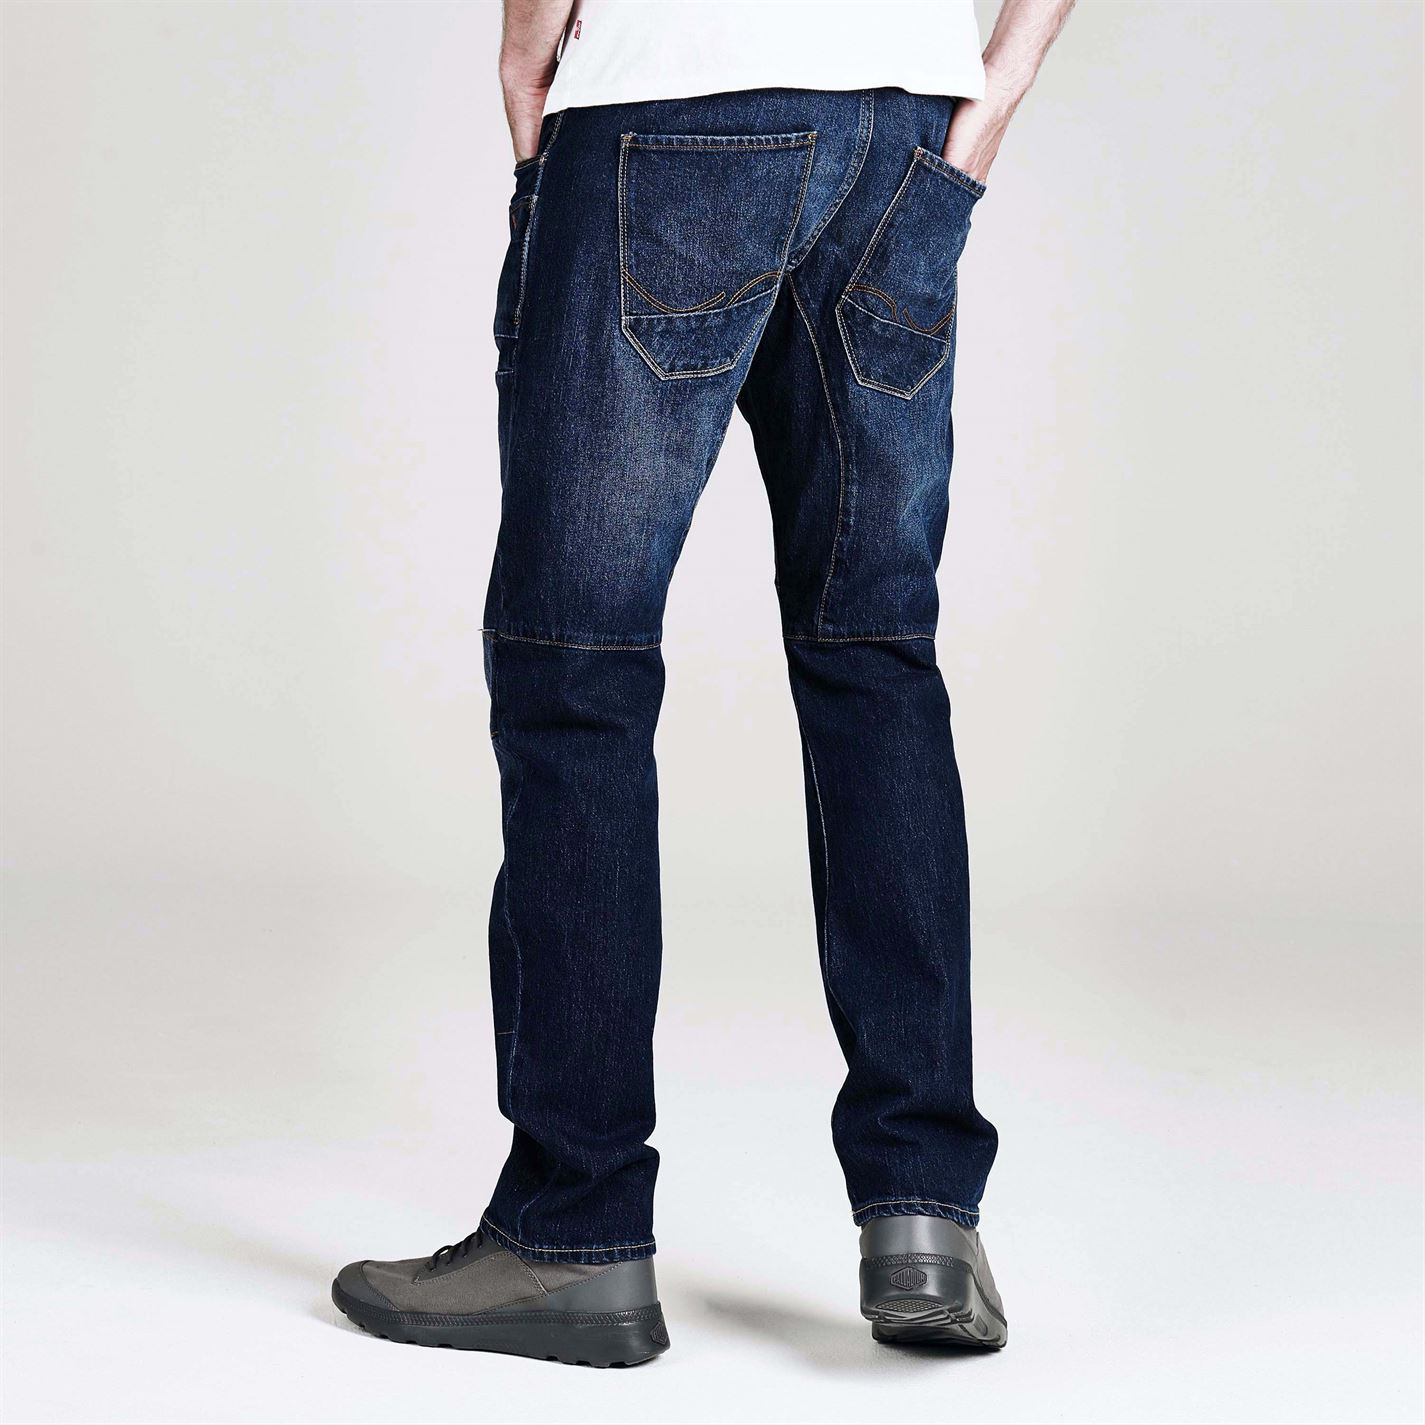 Jean-Denim-Jack-and-Jones-Stan-Osaka-Anti-Fit-de-Jean-para-Hombre-Pantalones-Pantalon-Oscuro-Wash miniatura 10